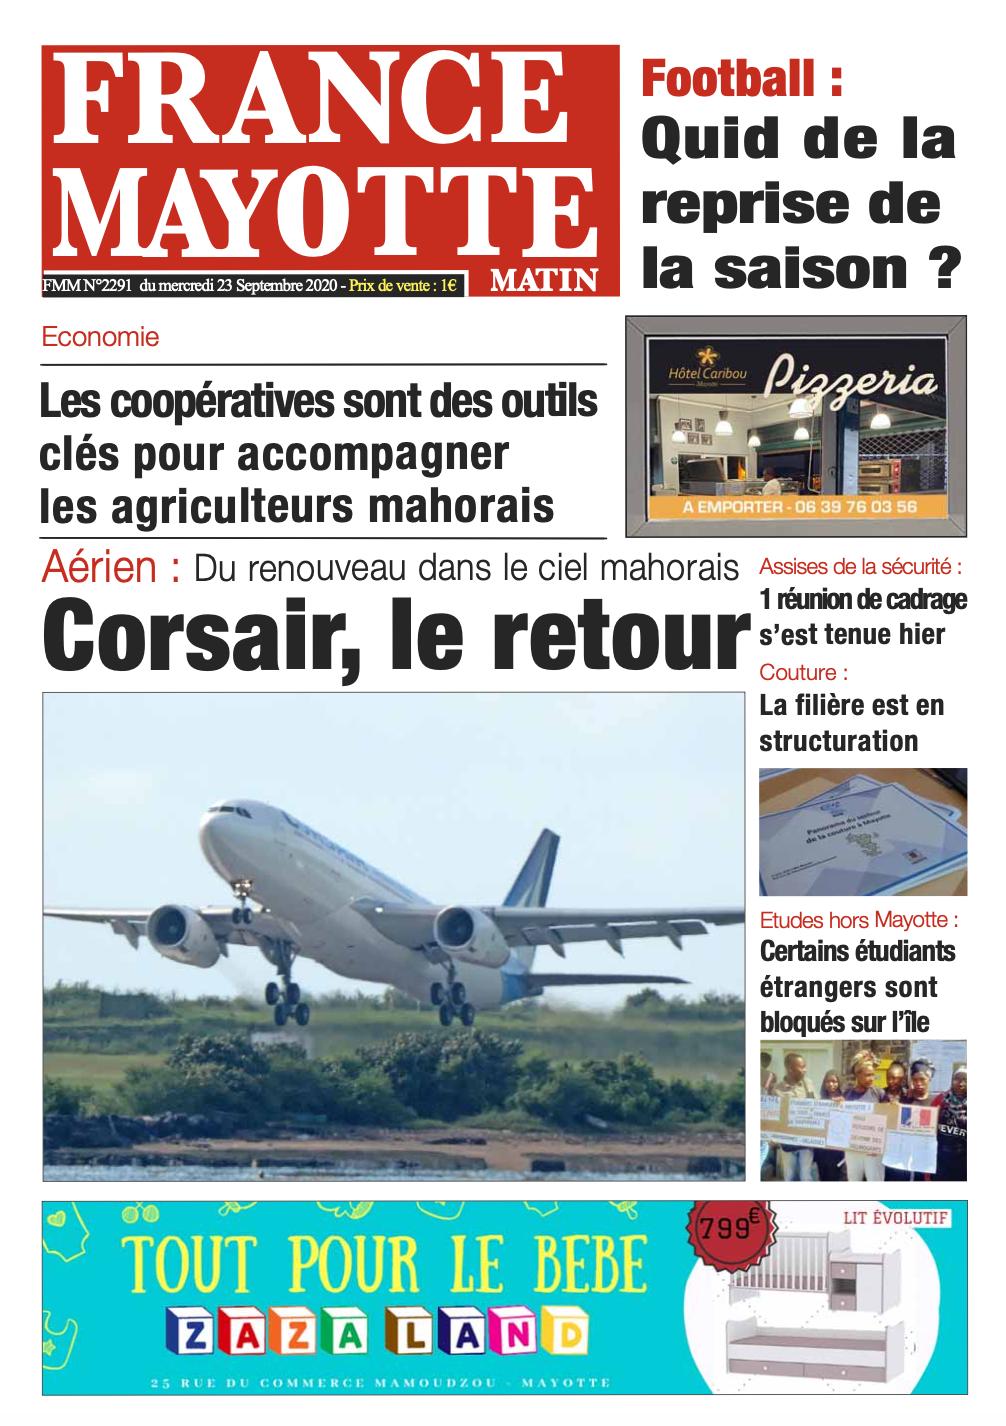 France Mayotte Mercredi 23 septembre 2020